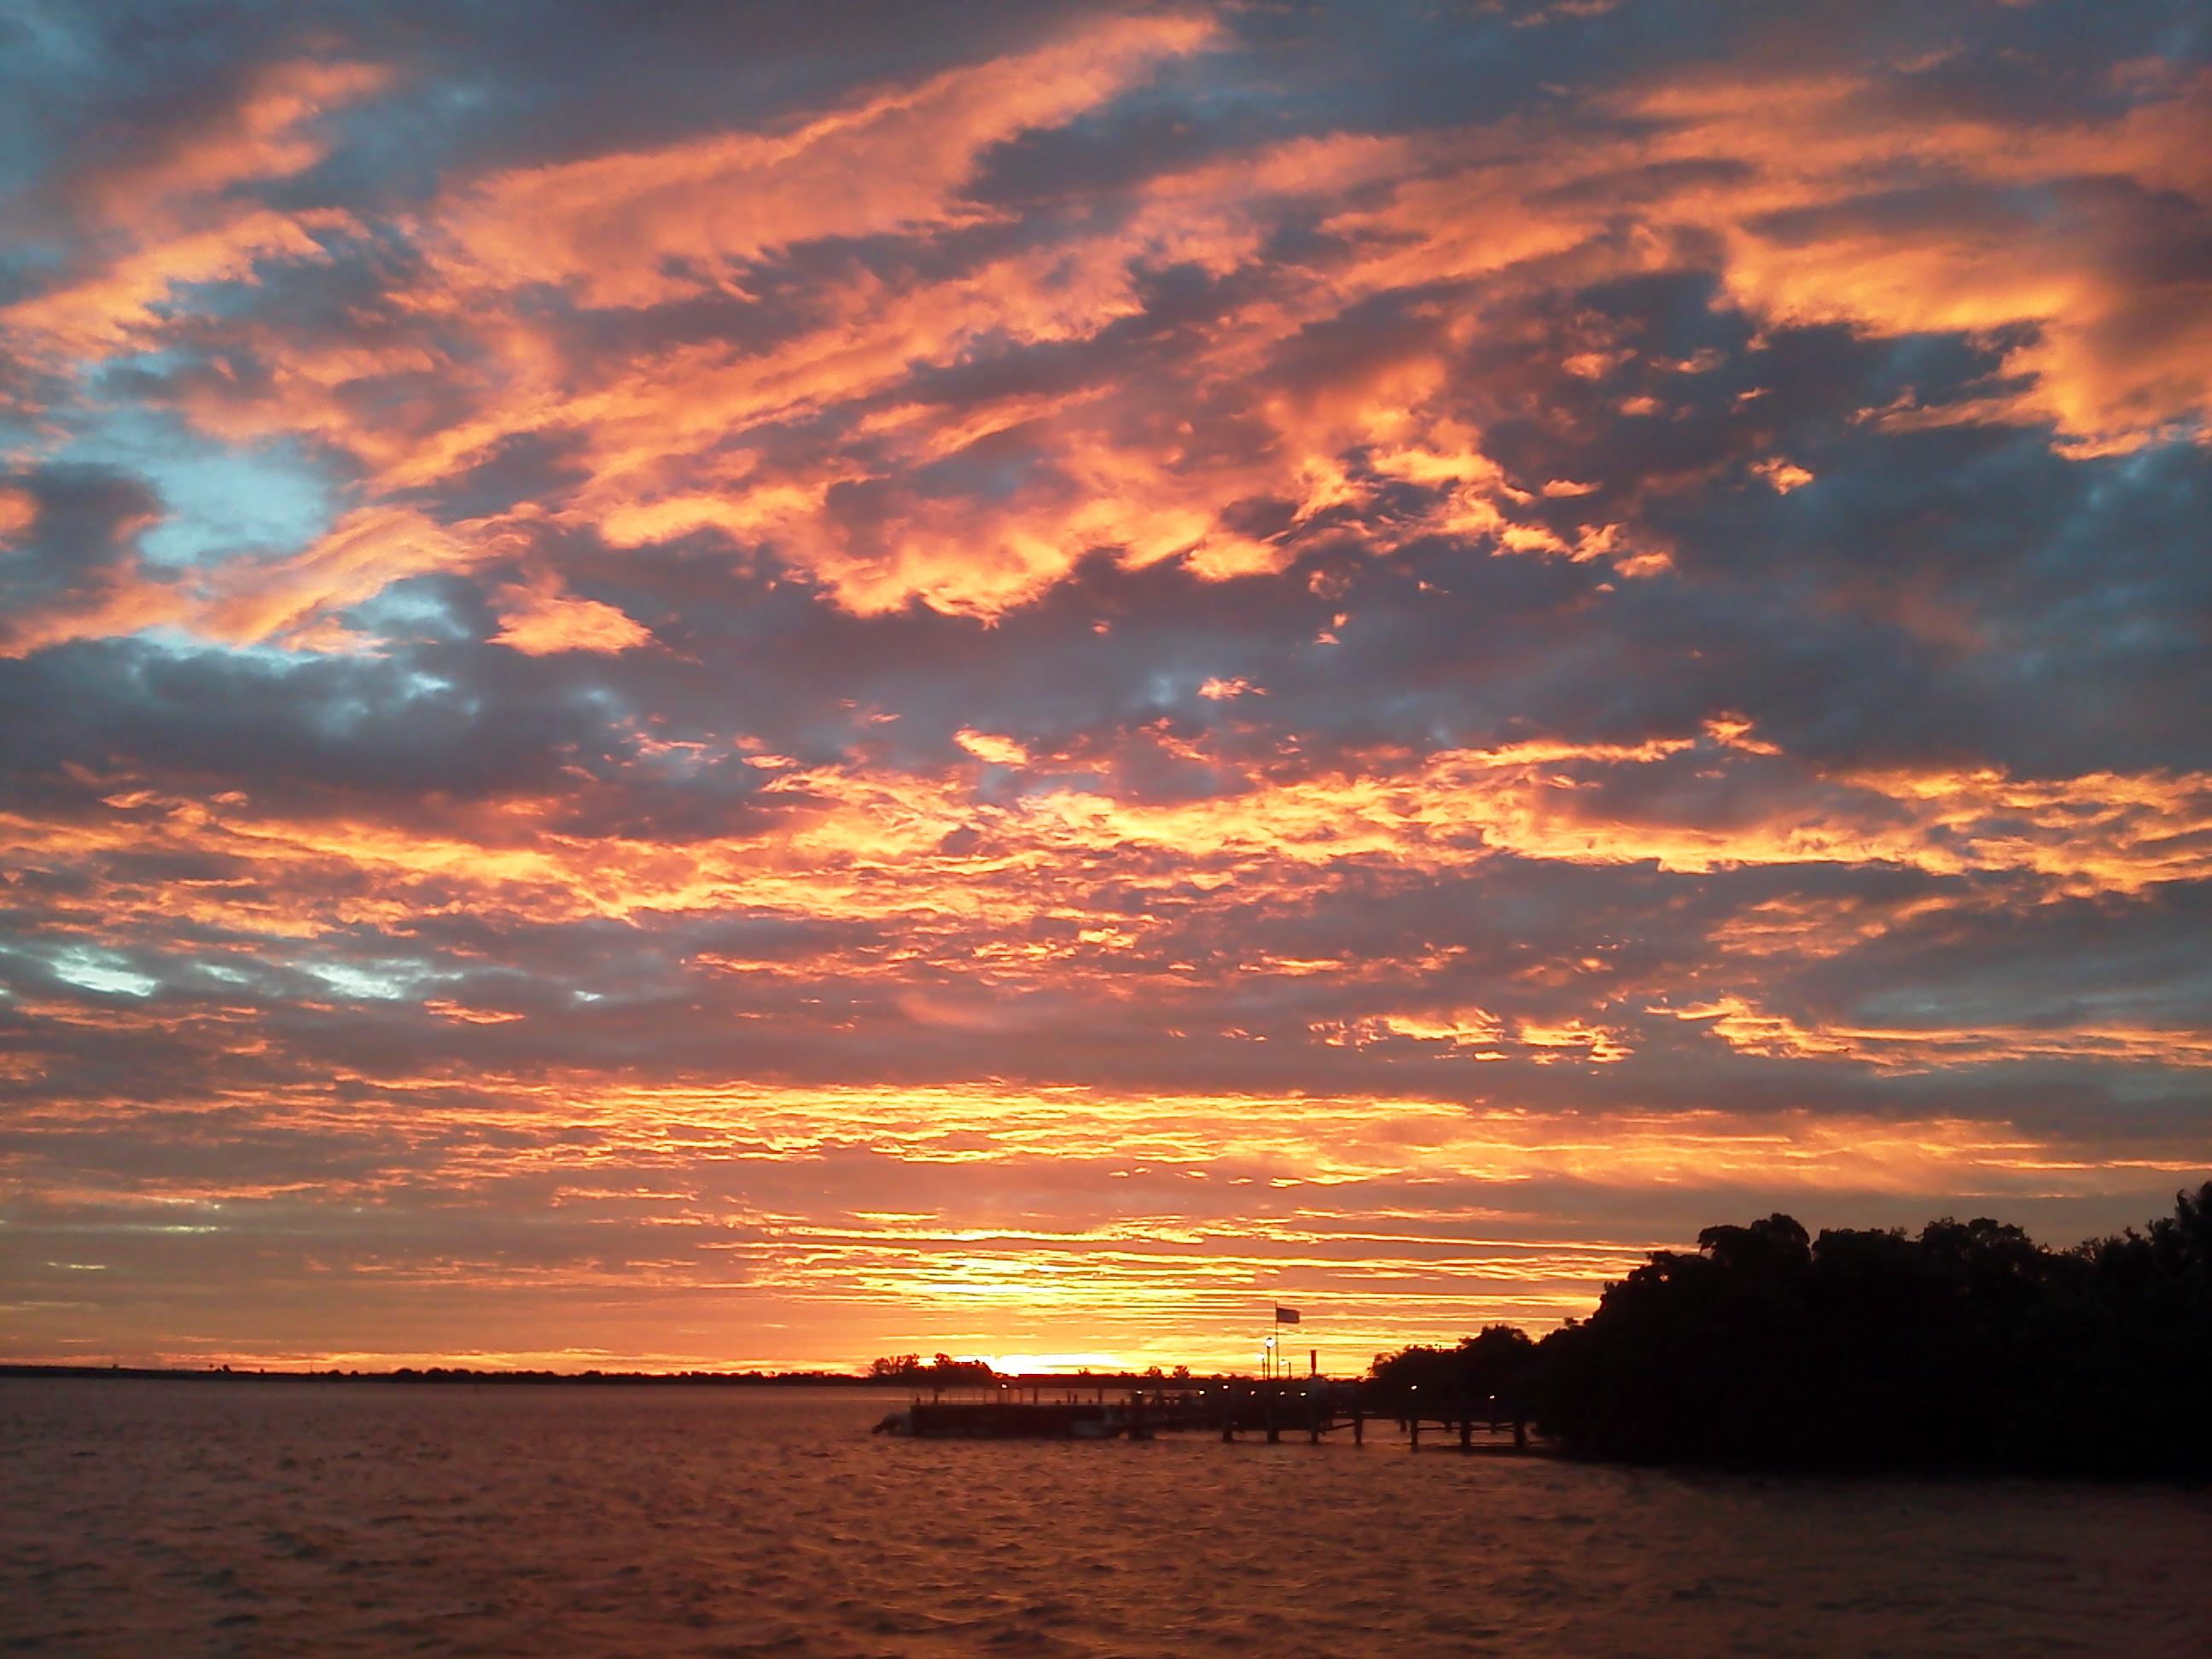 File:Little Gasparilla sunrise.jpg - Wikimedia Commons